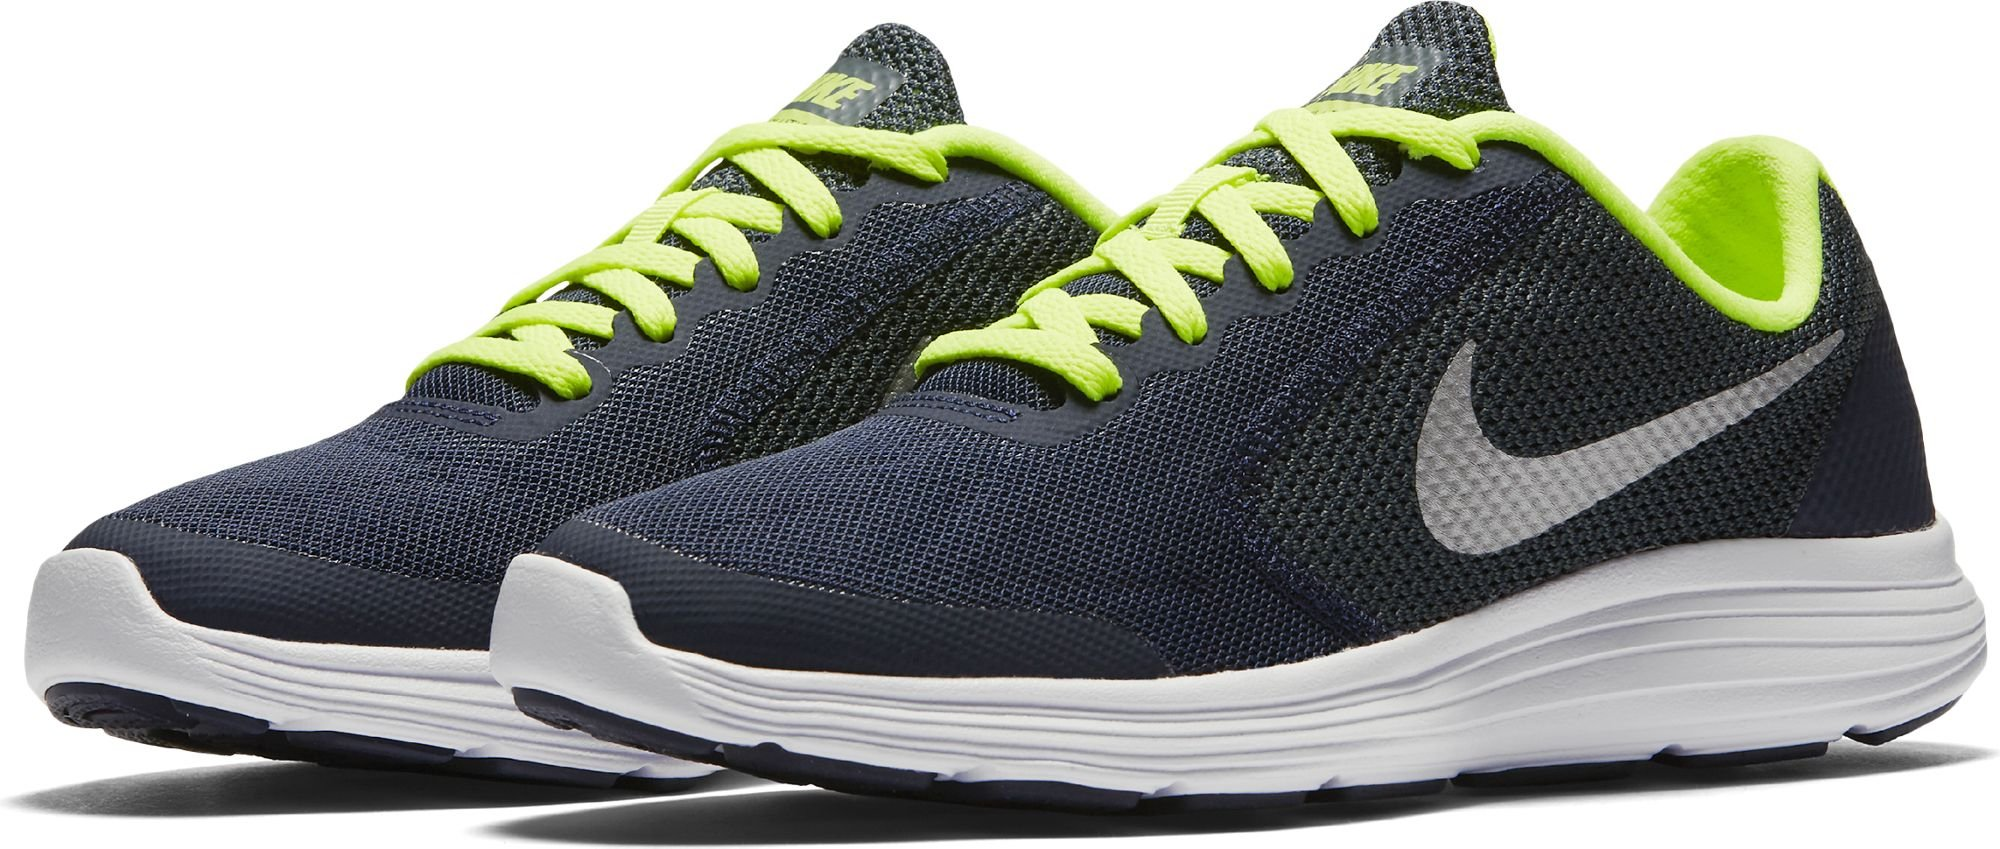 6ccb152f Galleon - Nike Boys' Revolution 3 (GS) Running Shoe, Obsidian ...